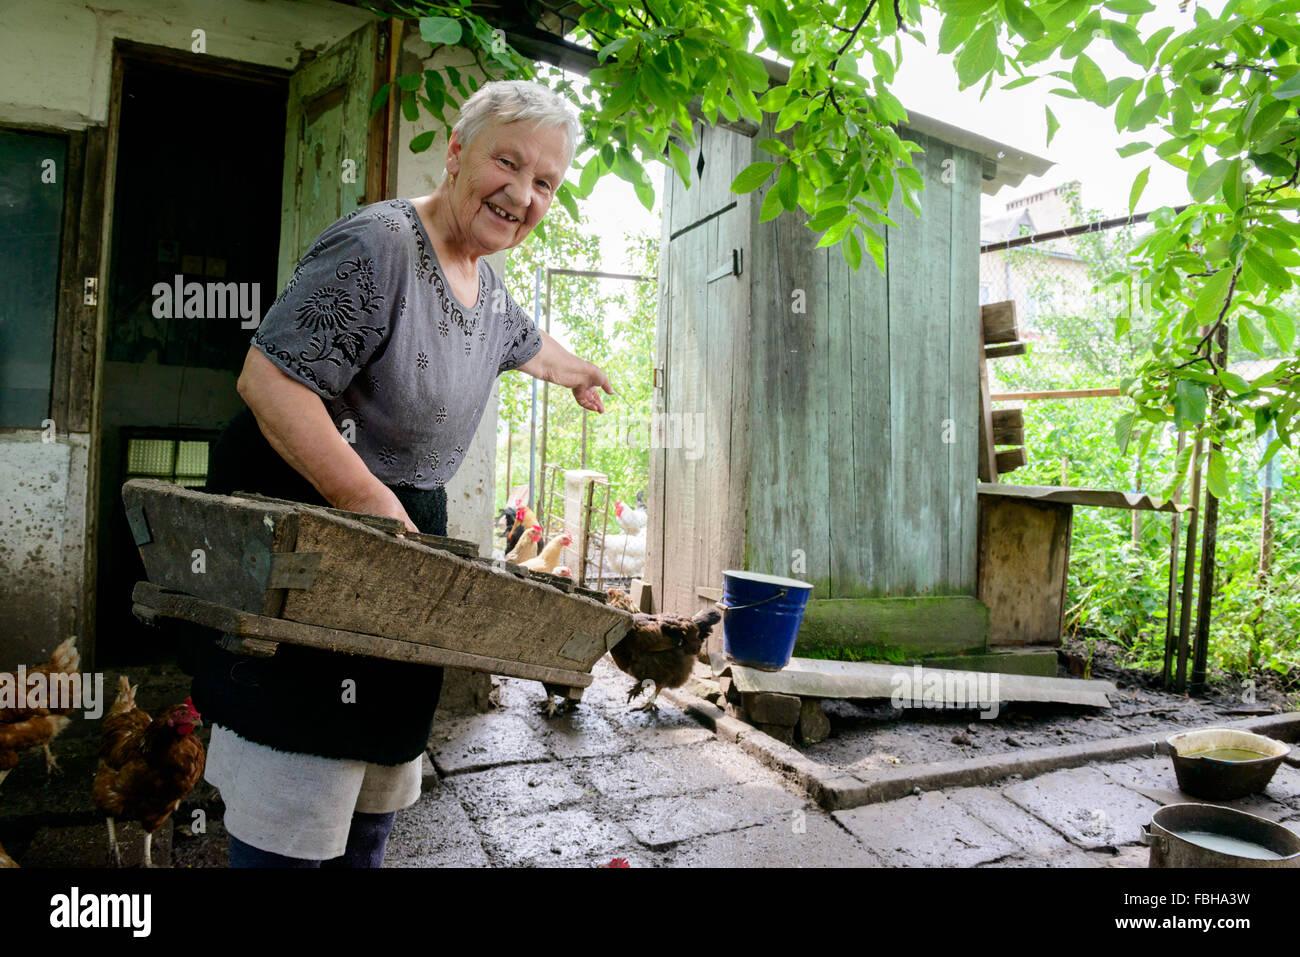 Woman farmer feeding chicken flock at a private rural farm in Ukraine - Stock Image